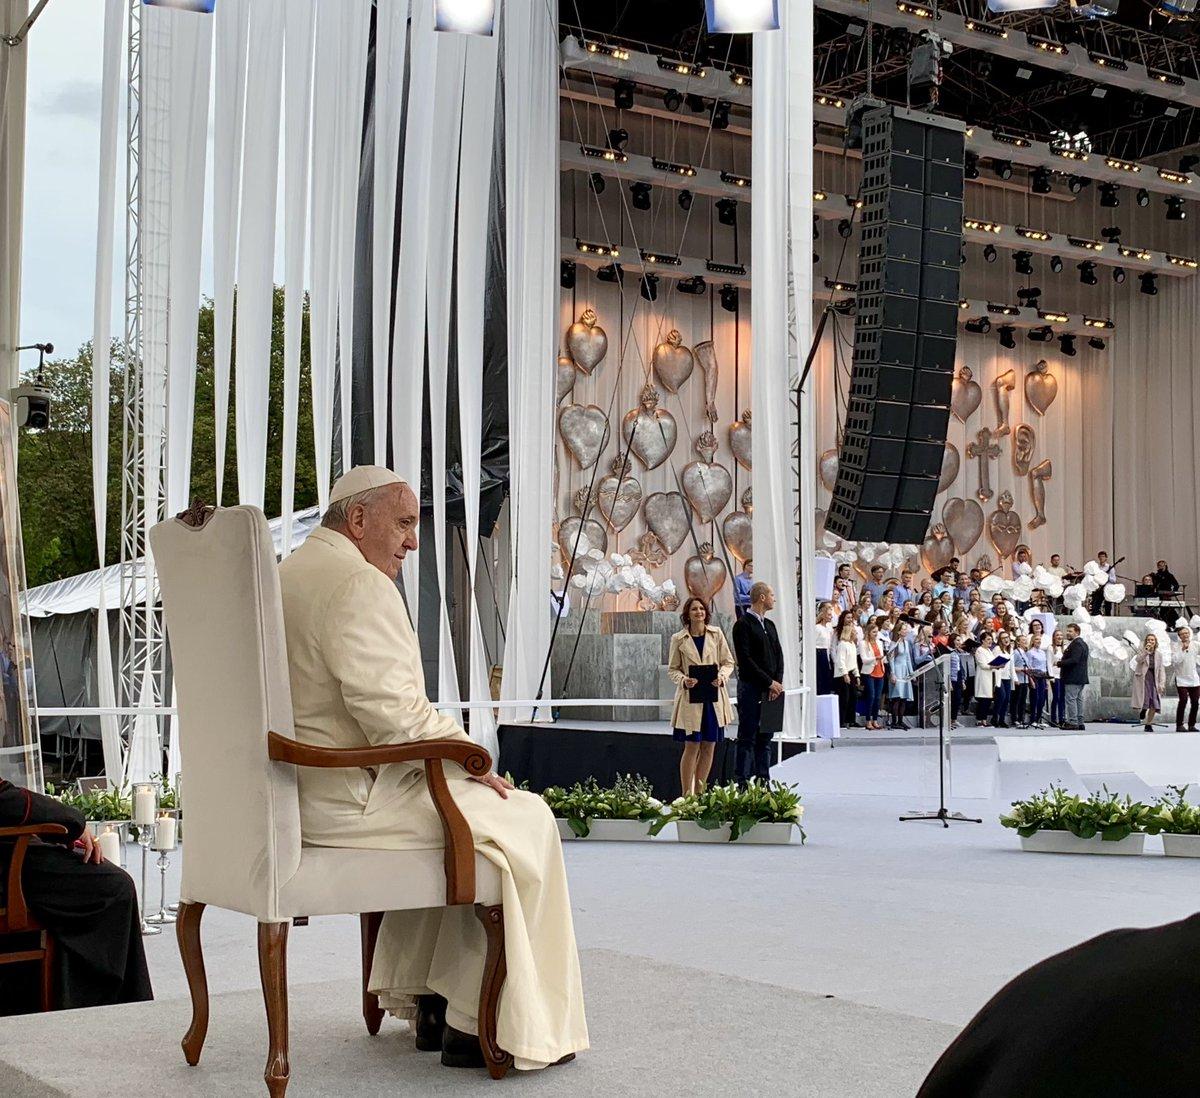 #PopeInLithuania